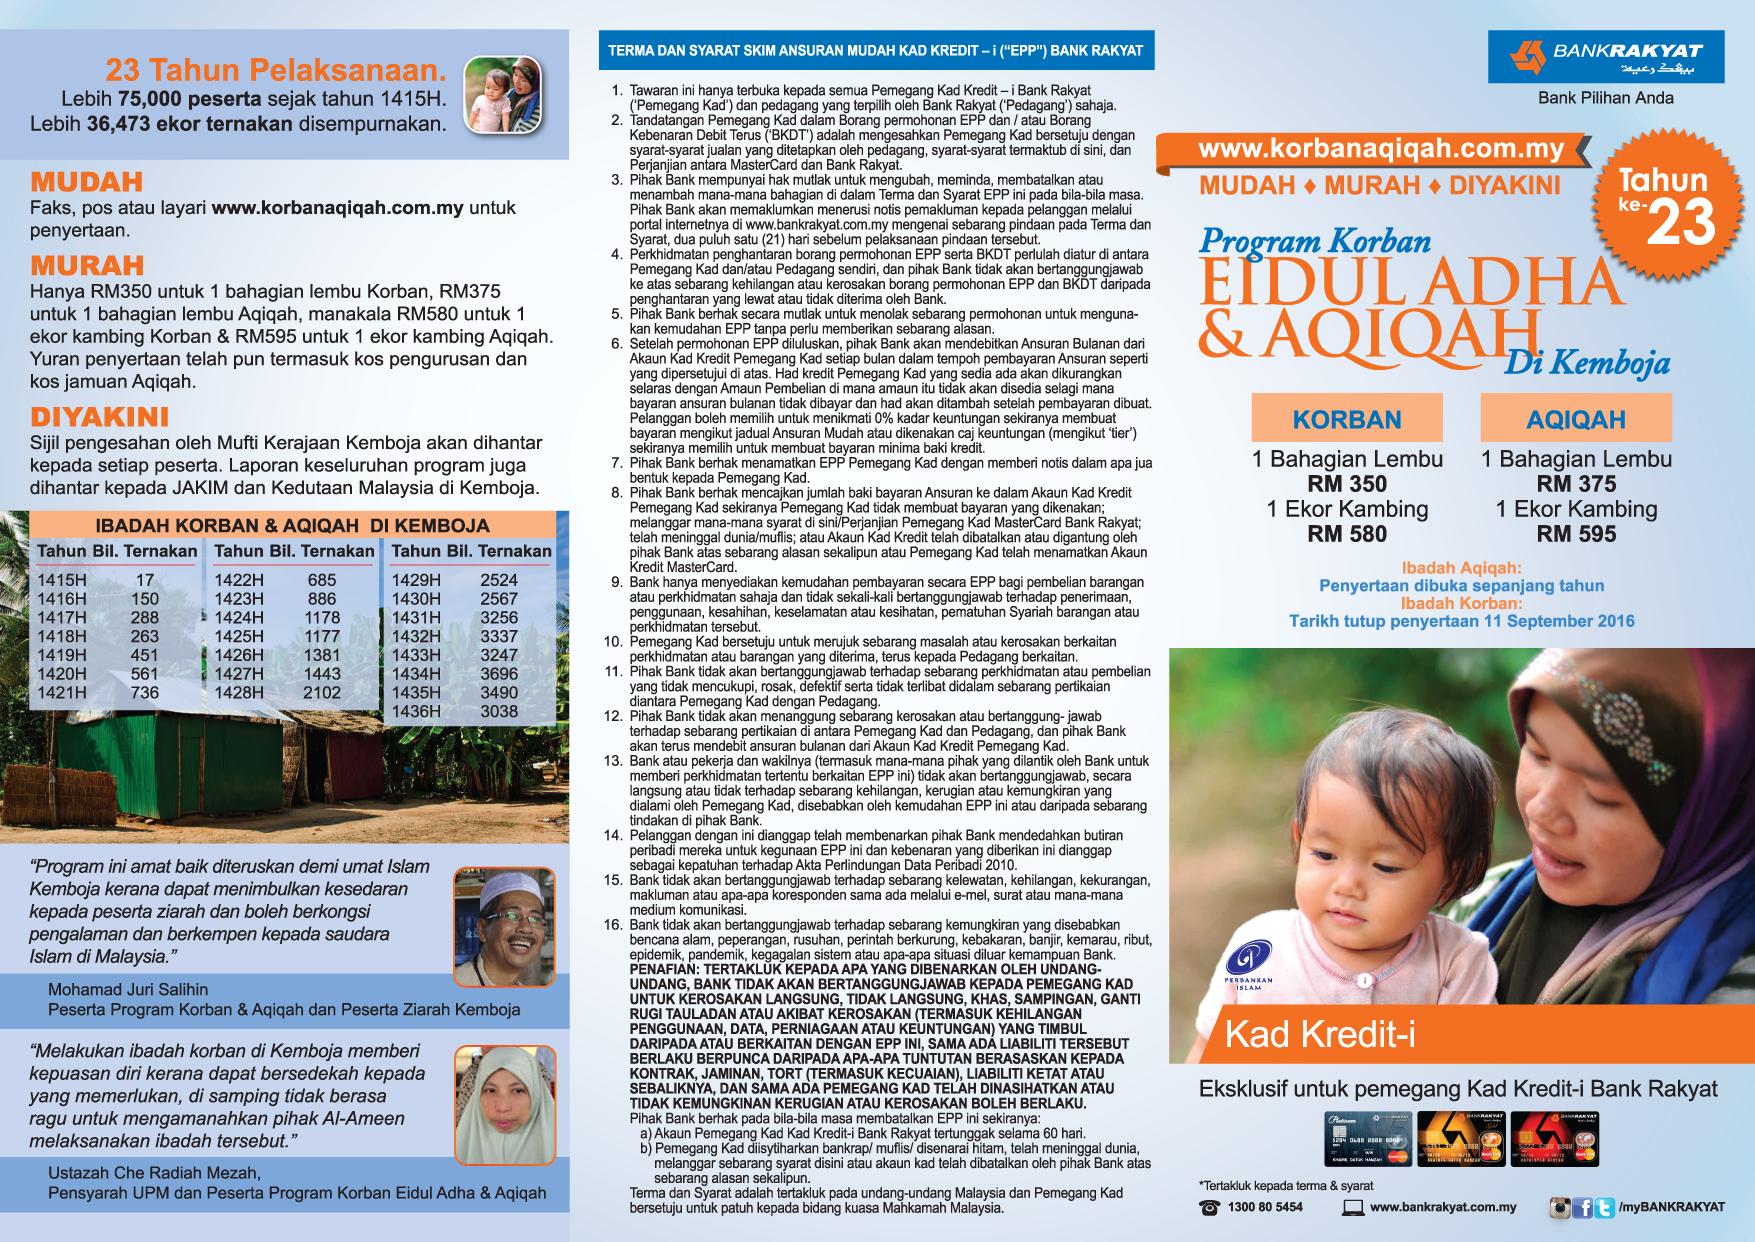 Program Korban di Kemboja